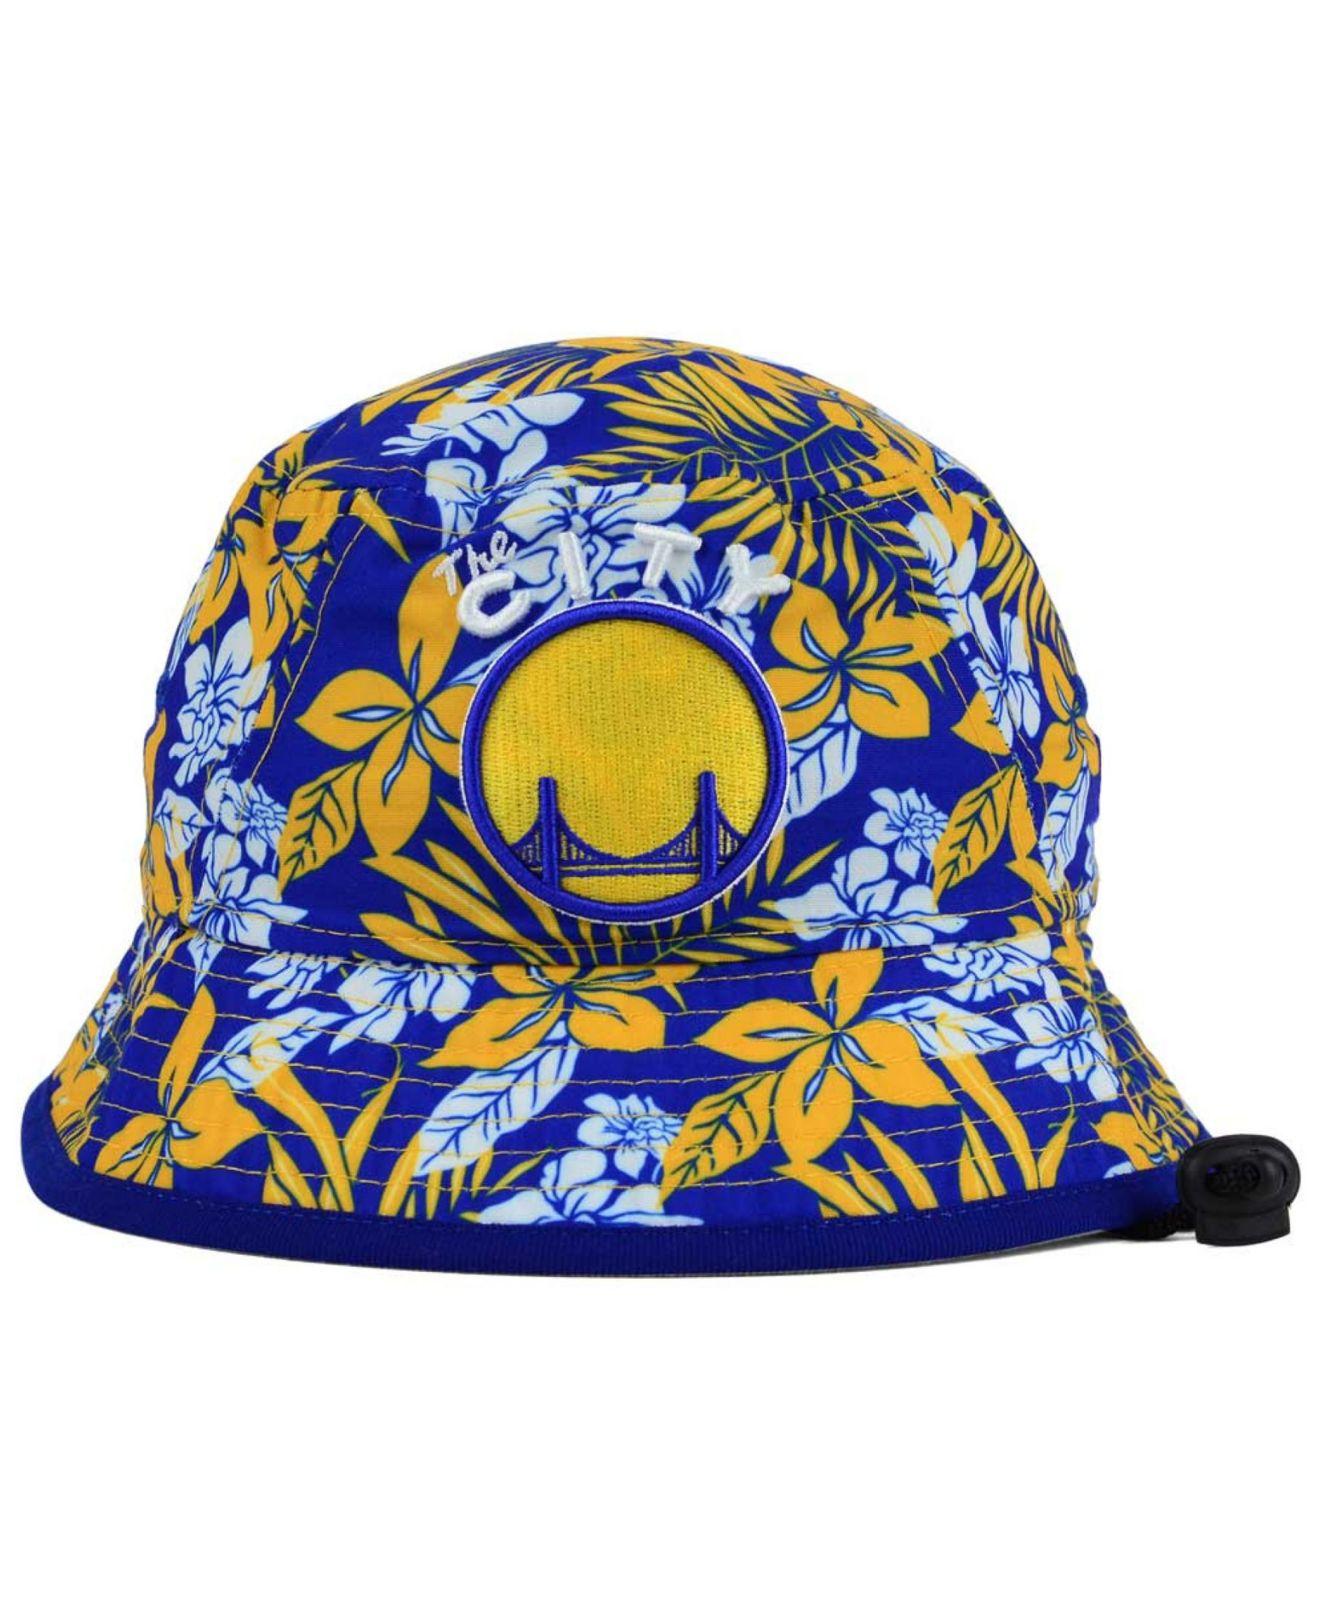 5e6b63c52 get bucket hat golden state warriors c0ed9 51020